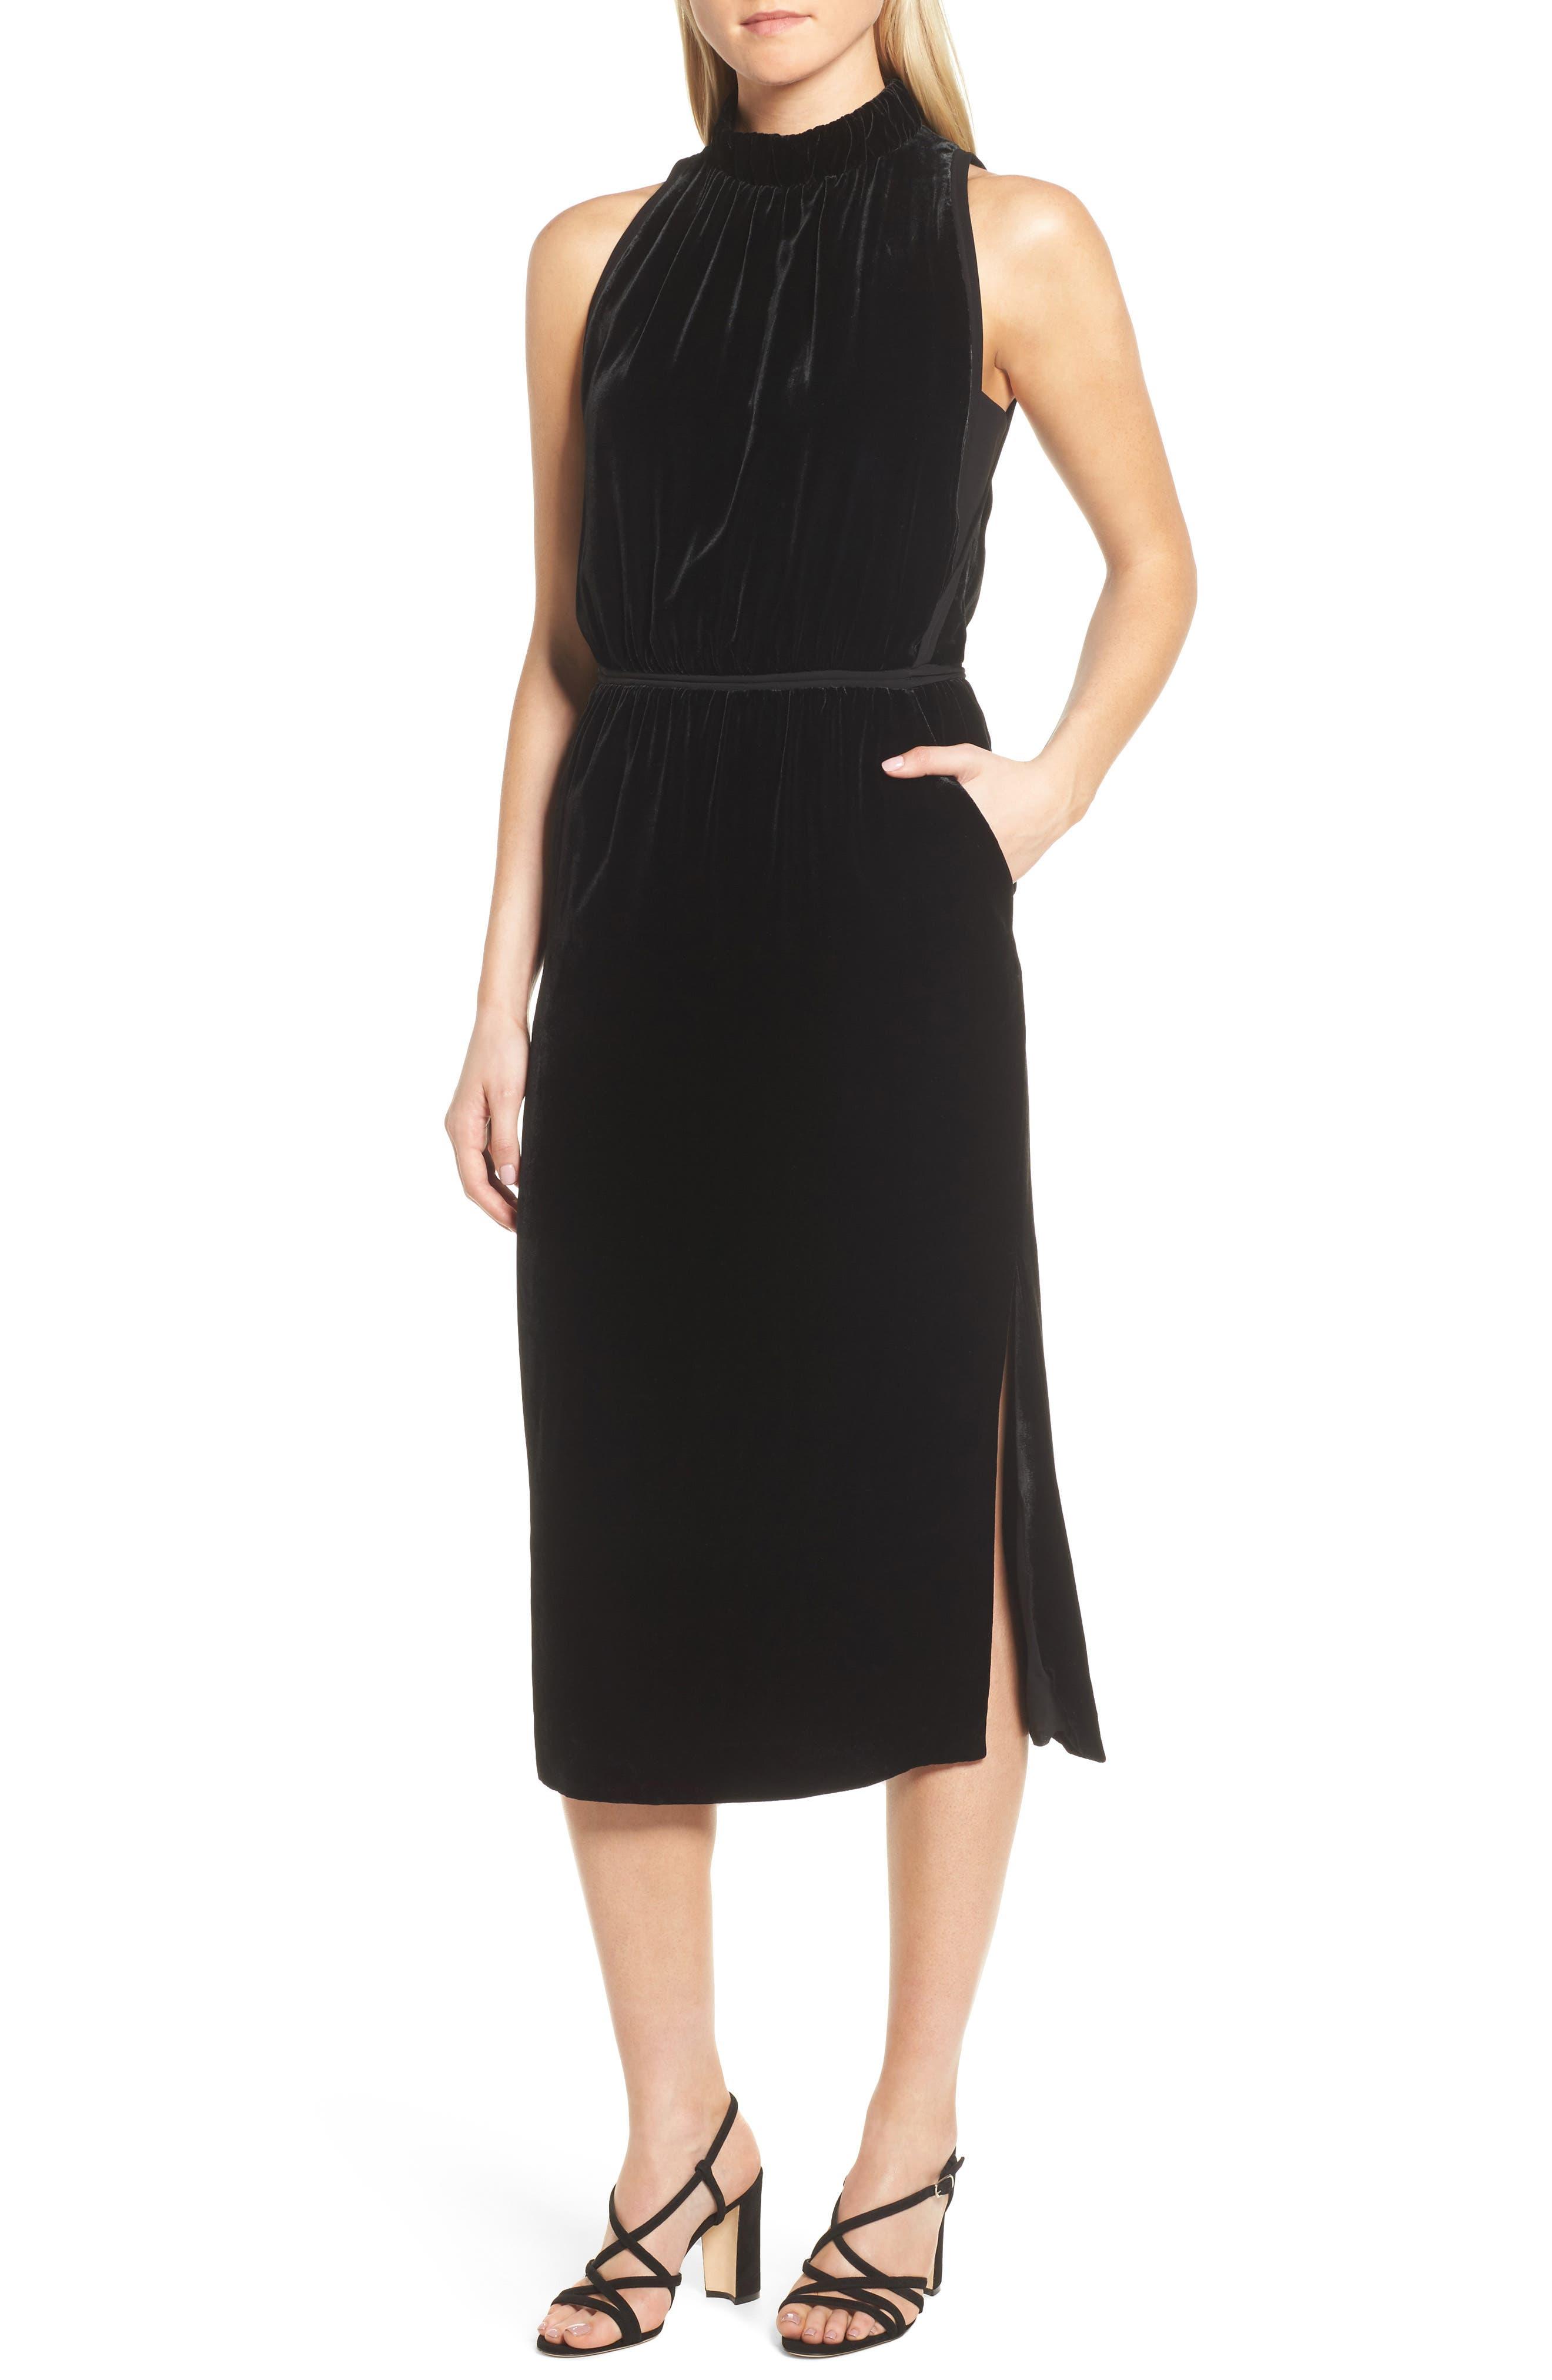 Difosia Velvet Midi Dress,                         Main,                         color, Black